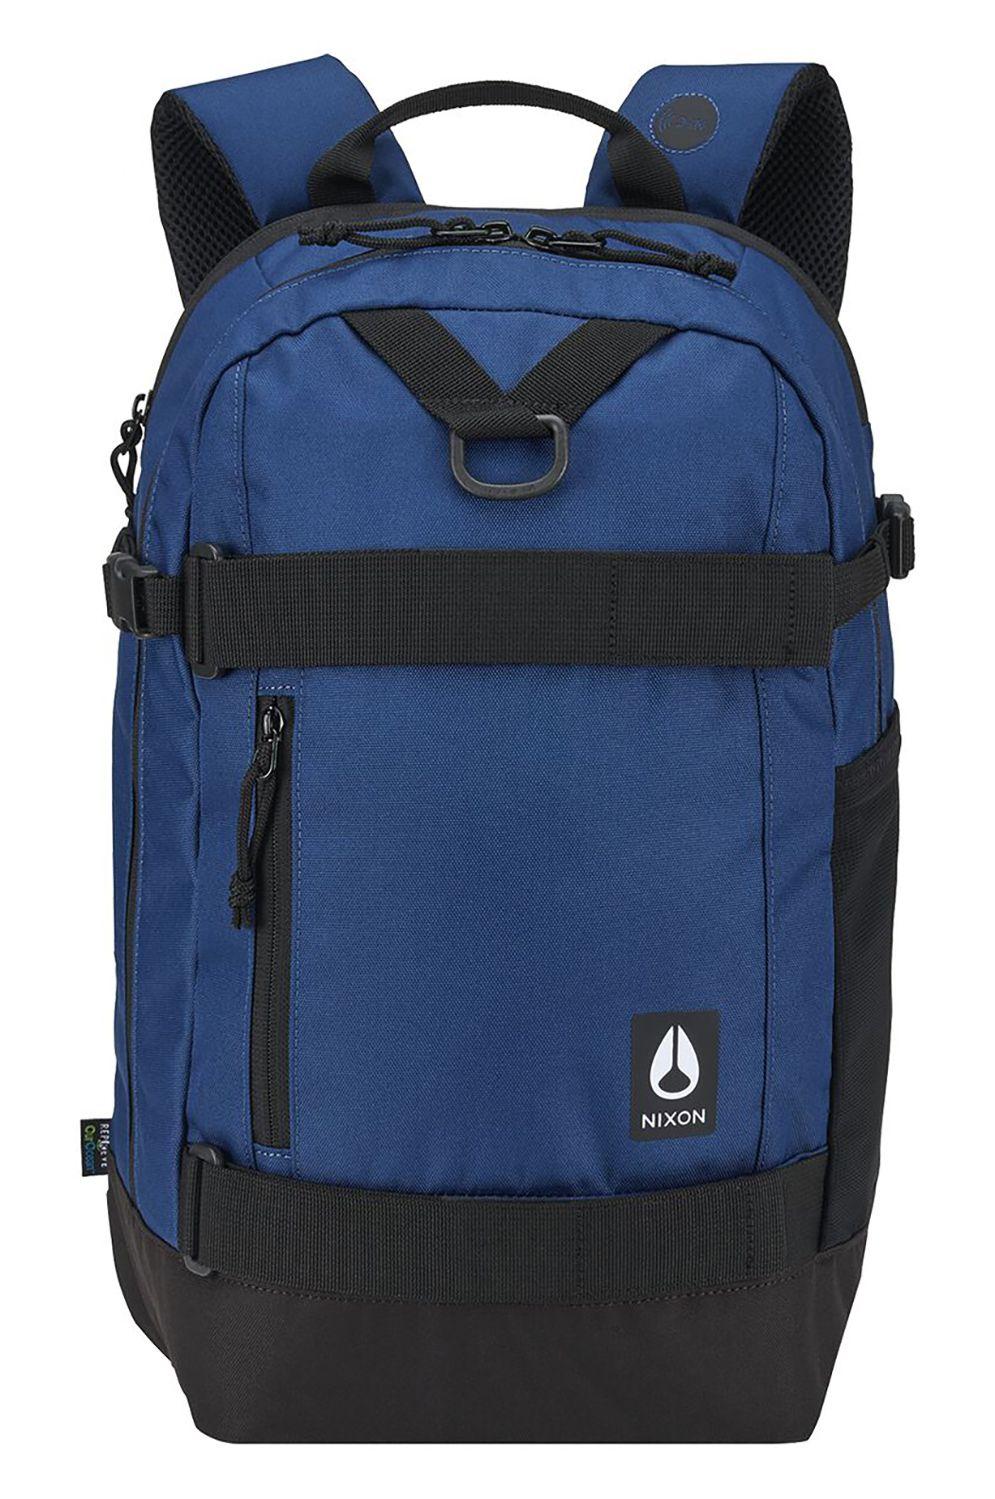 Nixon Backpack GAMMA BACKPACK Navy/Black